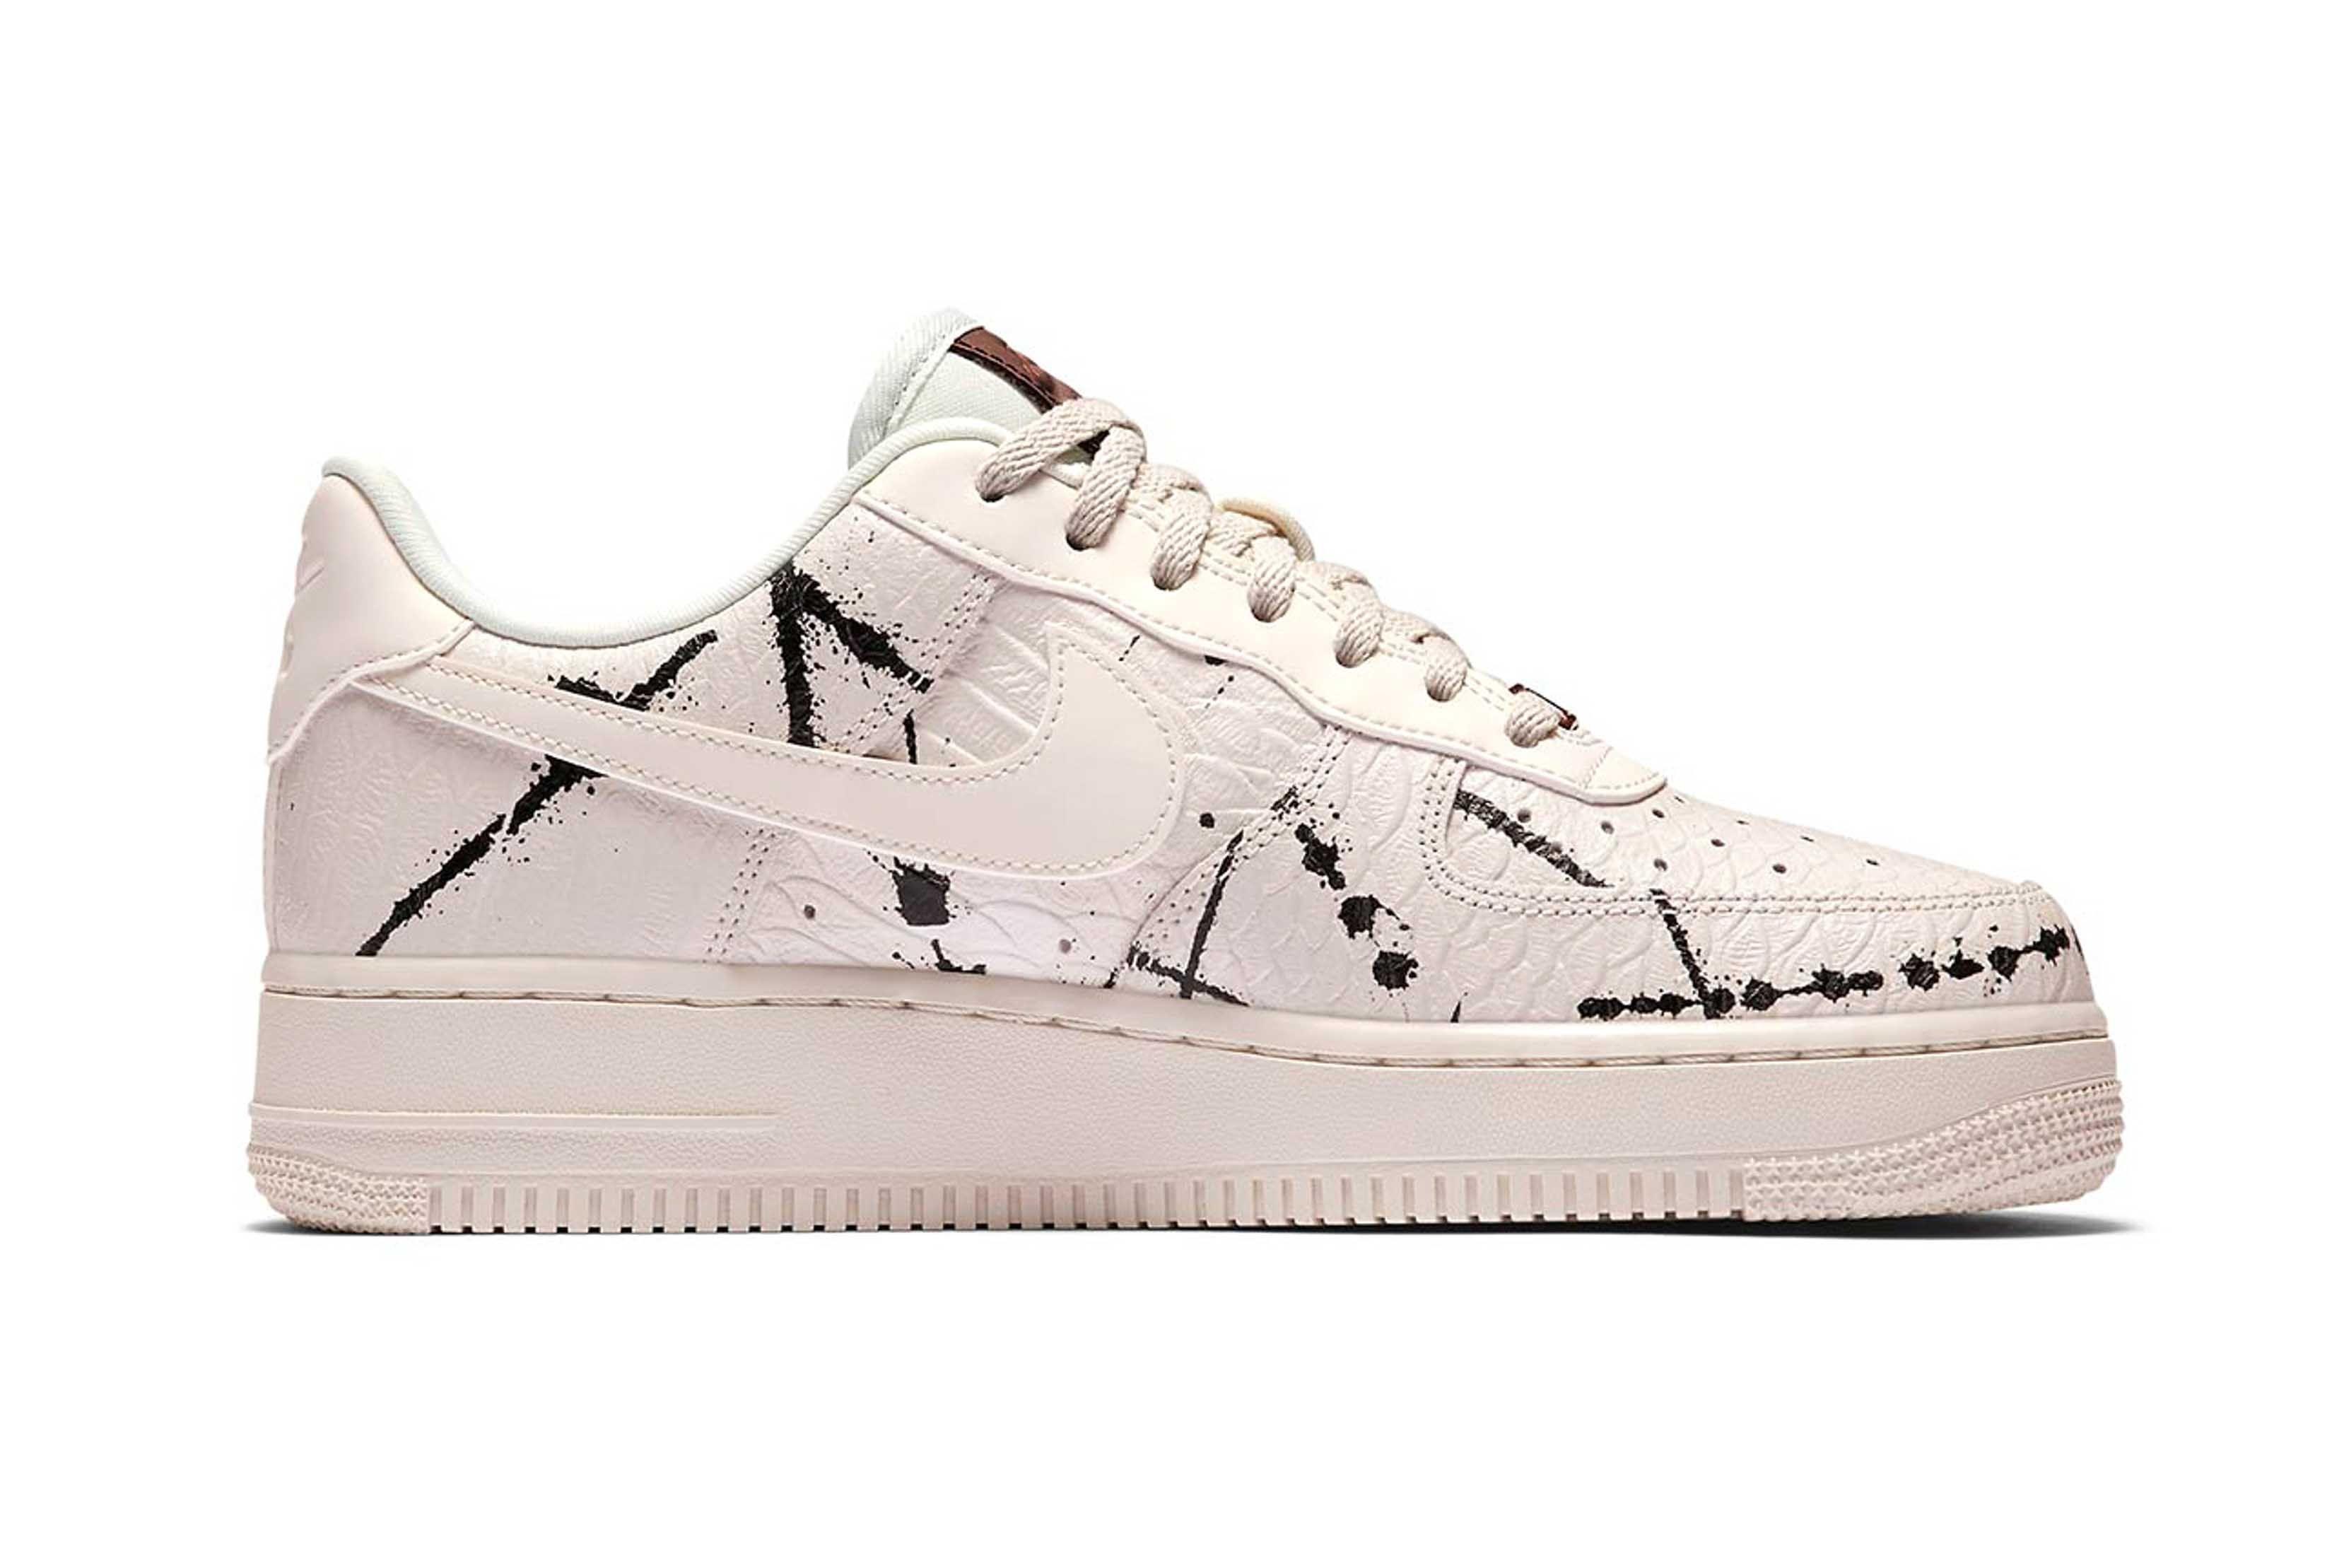 Nike Air Force 1 Low Phantom Snakeskin Release 3 Sneaker Freaker